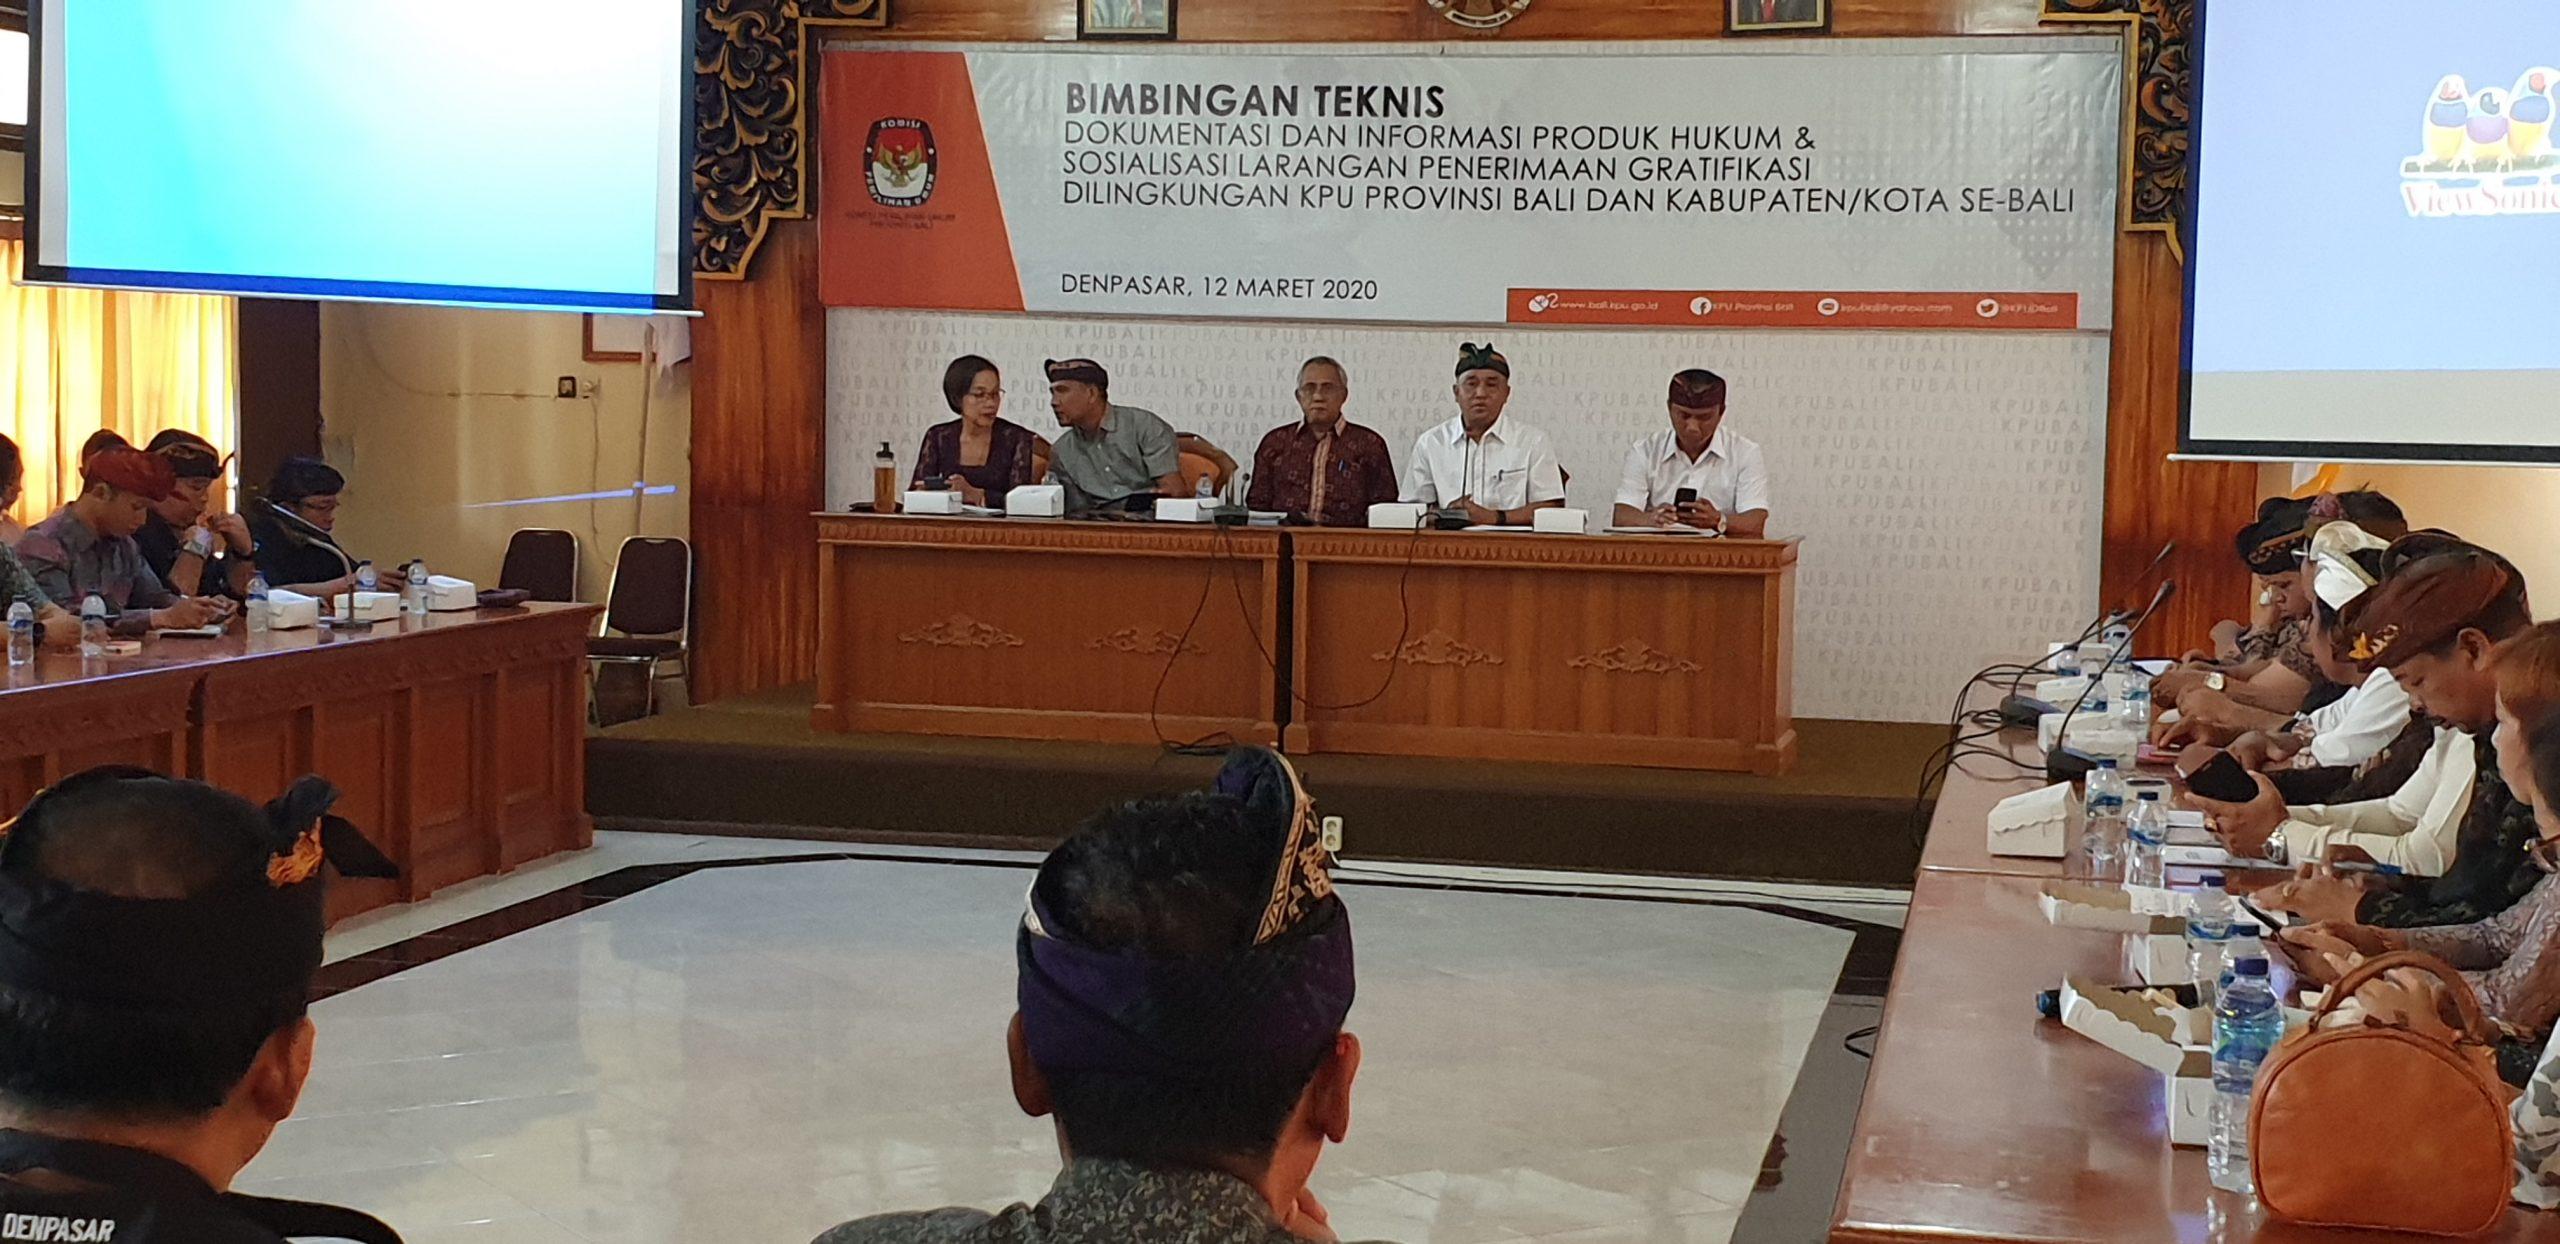 PARA komisioner dan sekretaris KPU di Bali menyimak pemaparan Ketua KPU Bali, I Dewa Agung Lidartawan (dua kanan di meja depan), dalam sosialisasi larangan menerima gratifikasi penyelenggara pemilu di KPU Bali, Kamis (12/3/2020). Foto: gus hendra